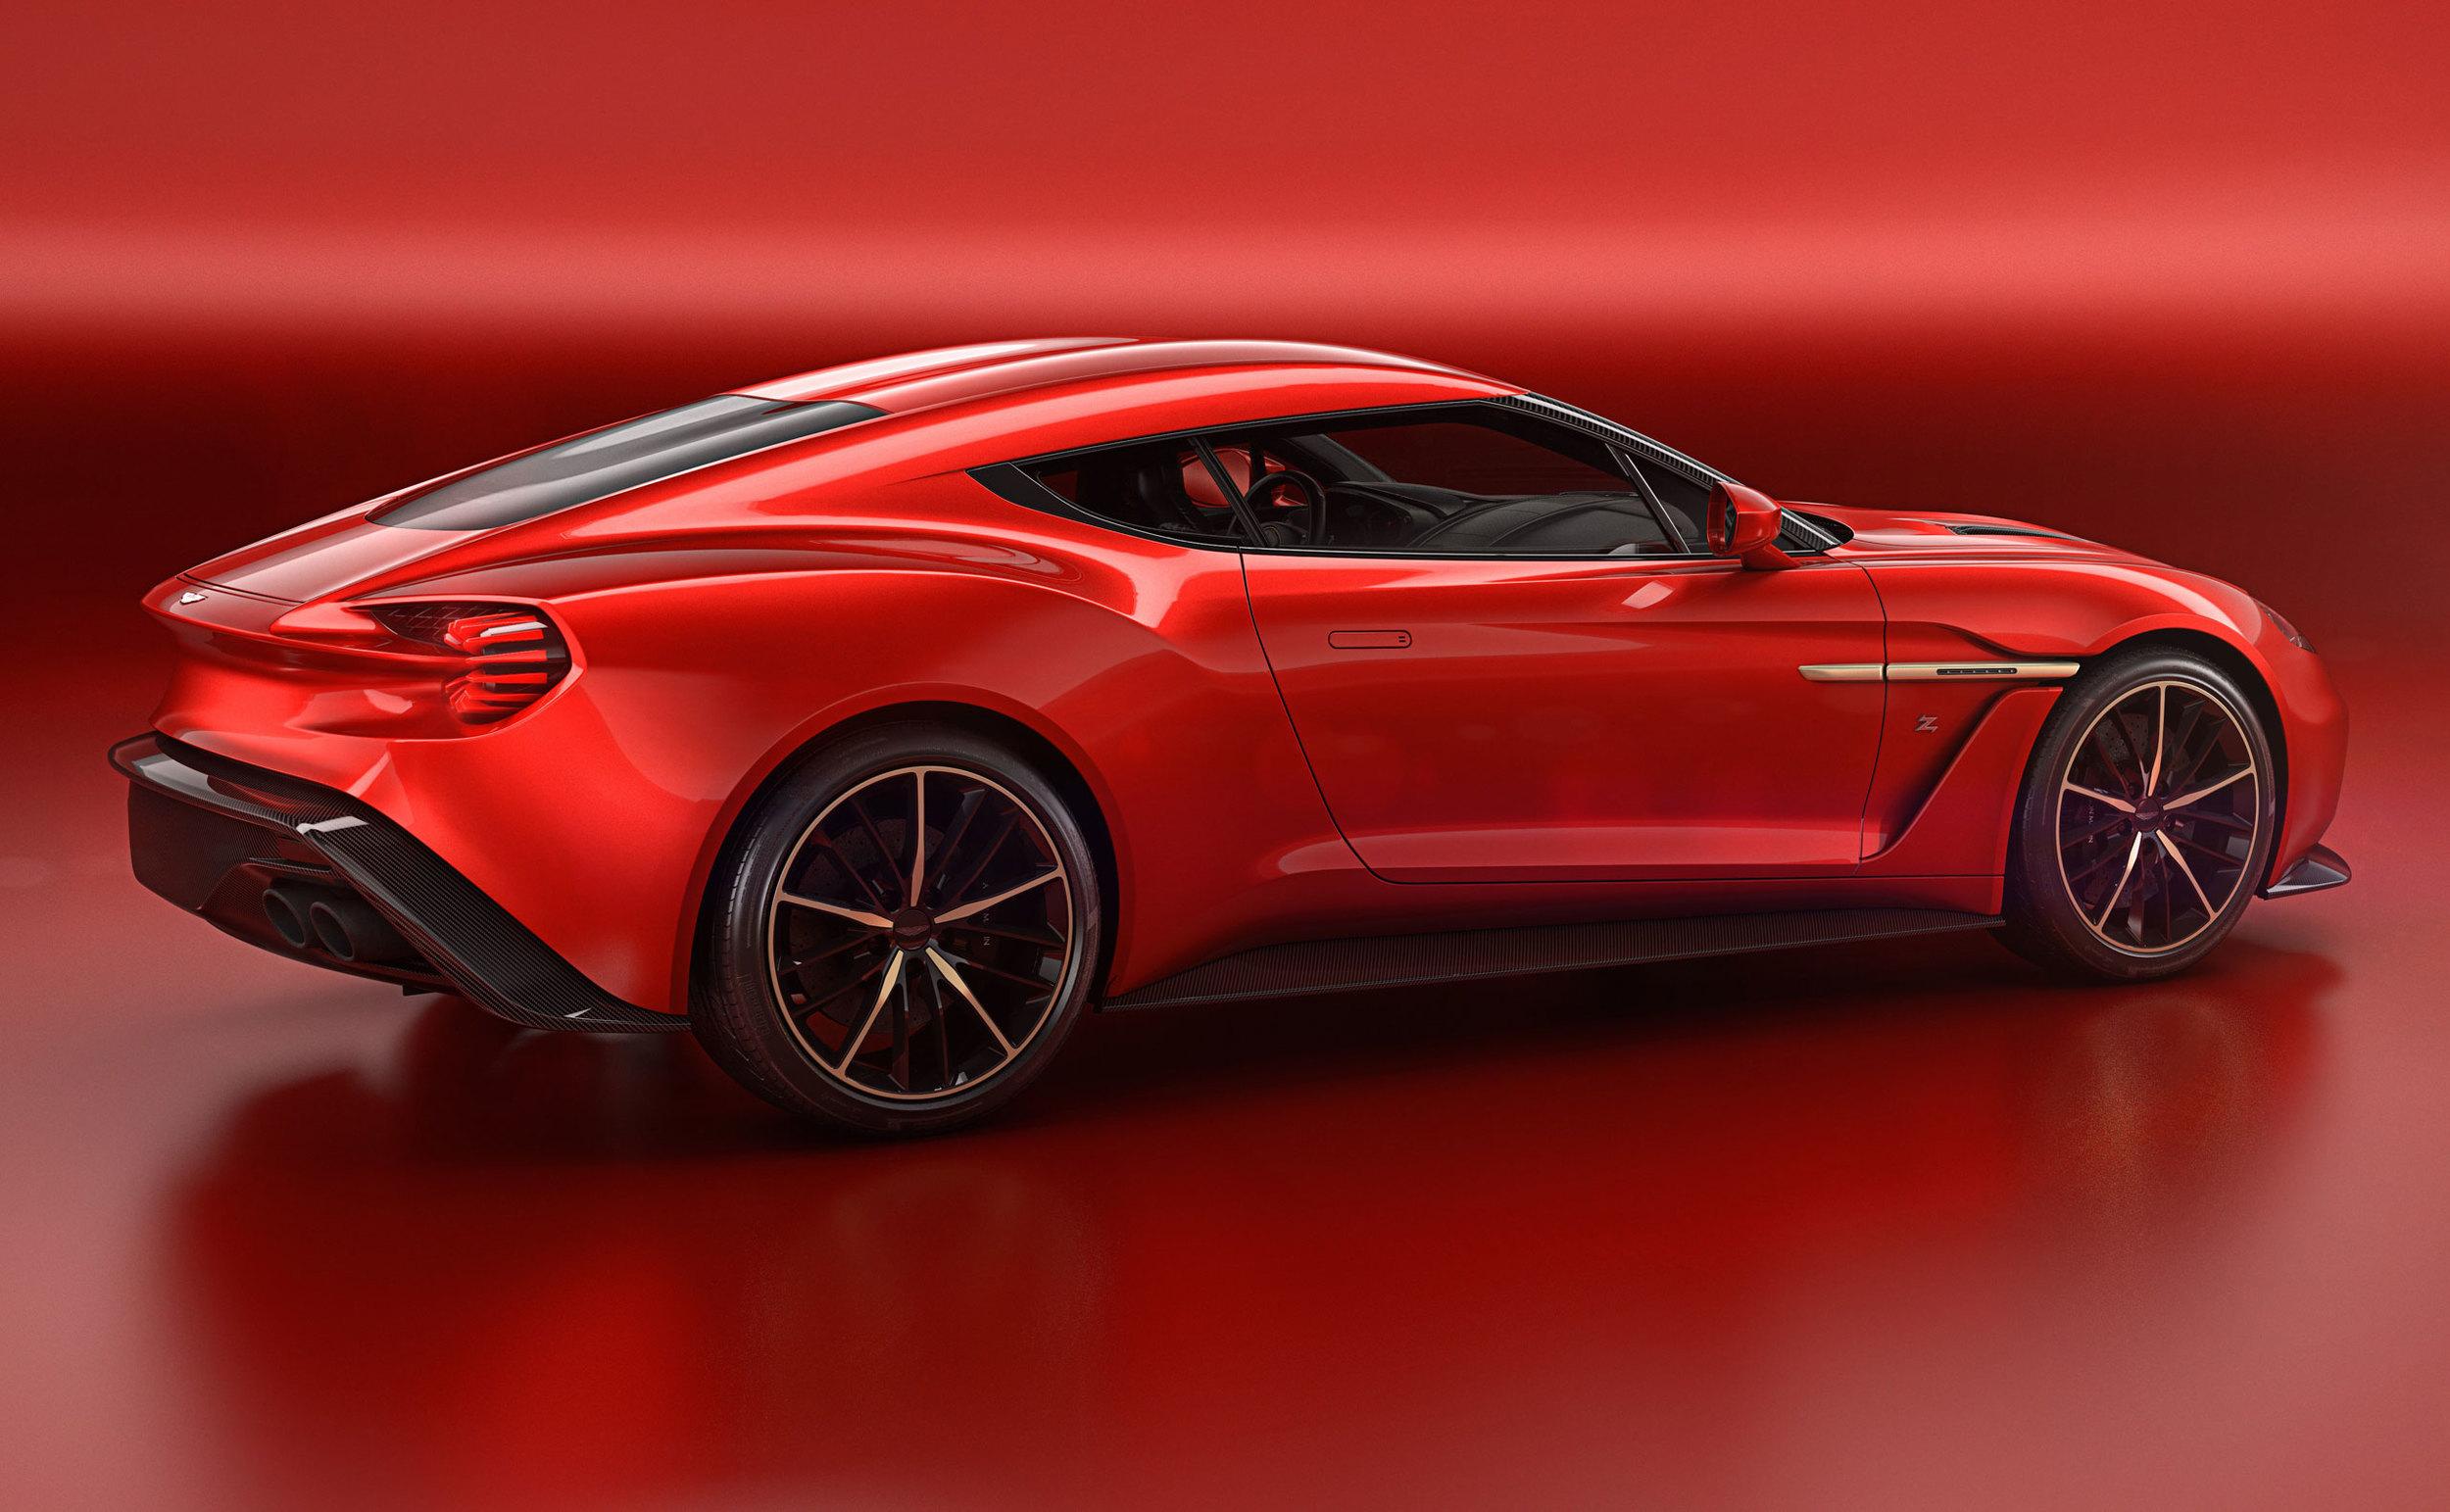 Aston-Martin-Vanquish-Zagato-Concept_05.jpg